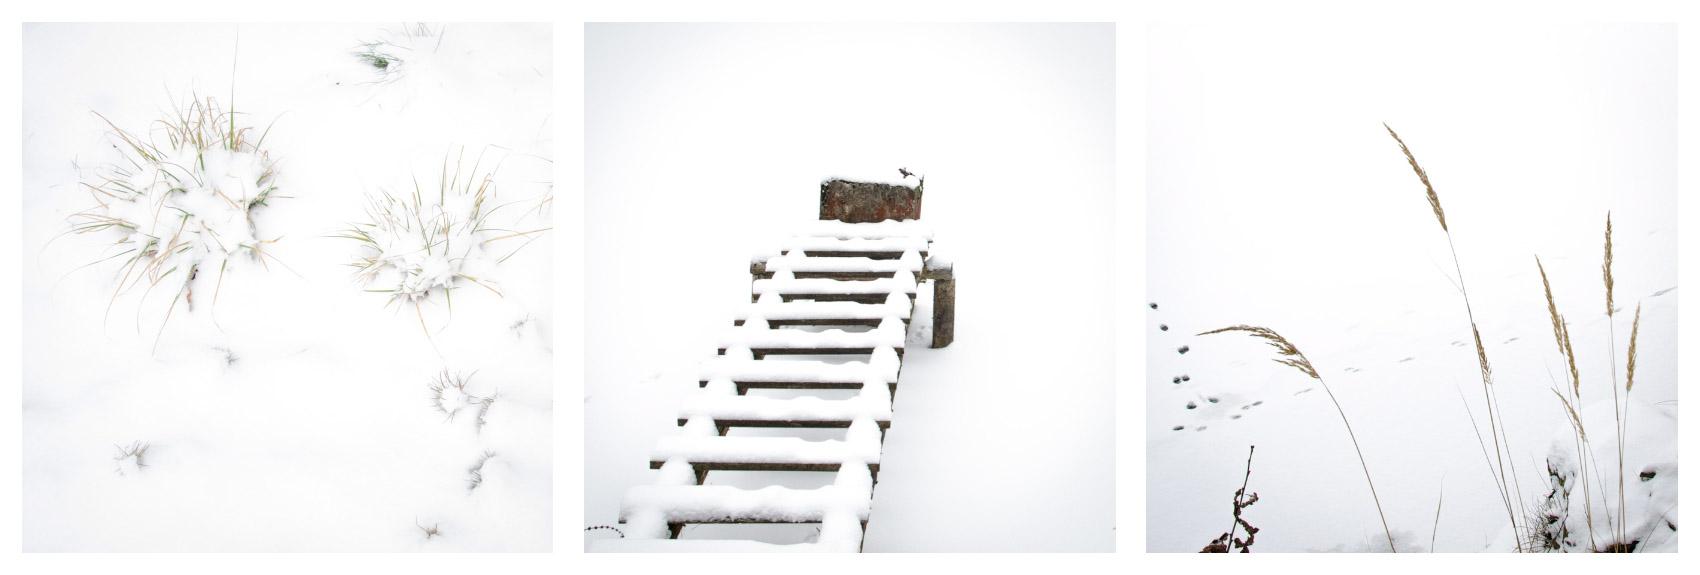 Snehovy-1b